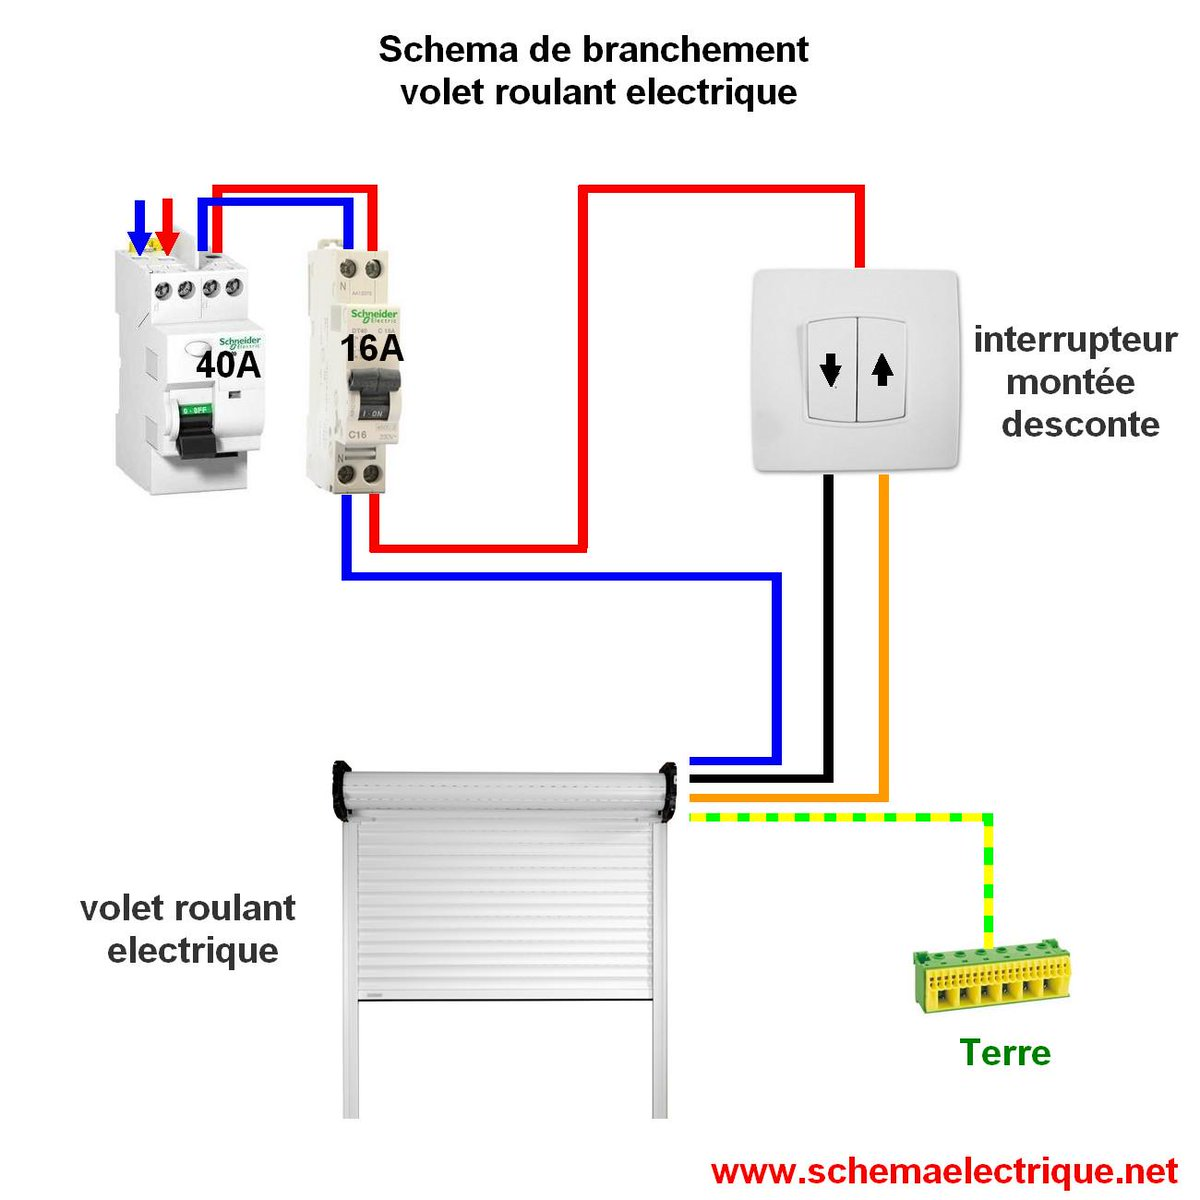 Schema electrique schemamaison twitter - Installation volet roulant electrique ...